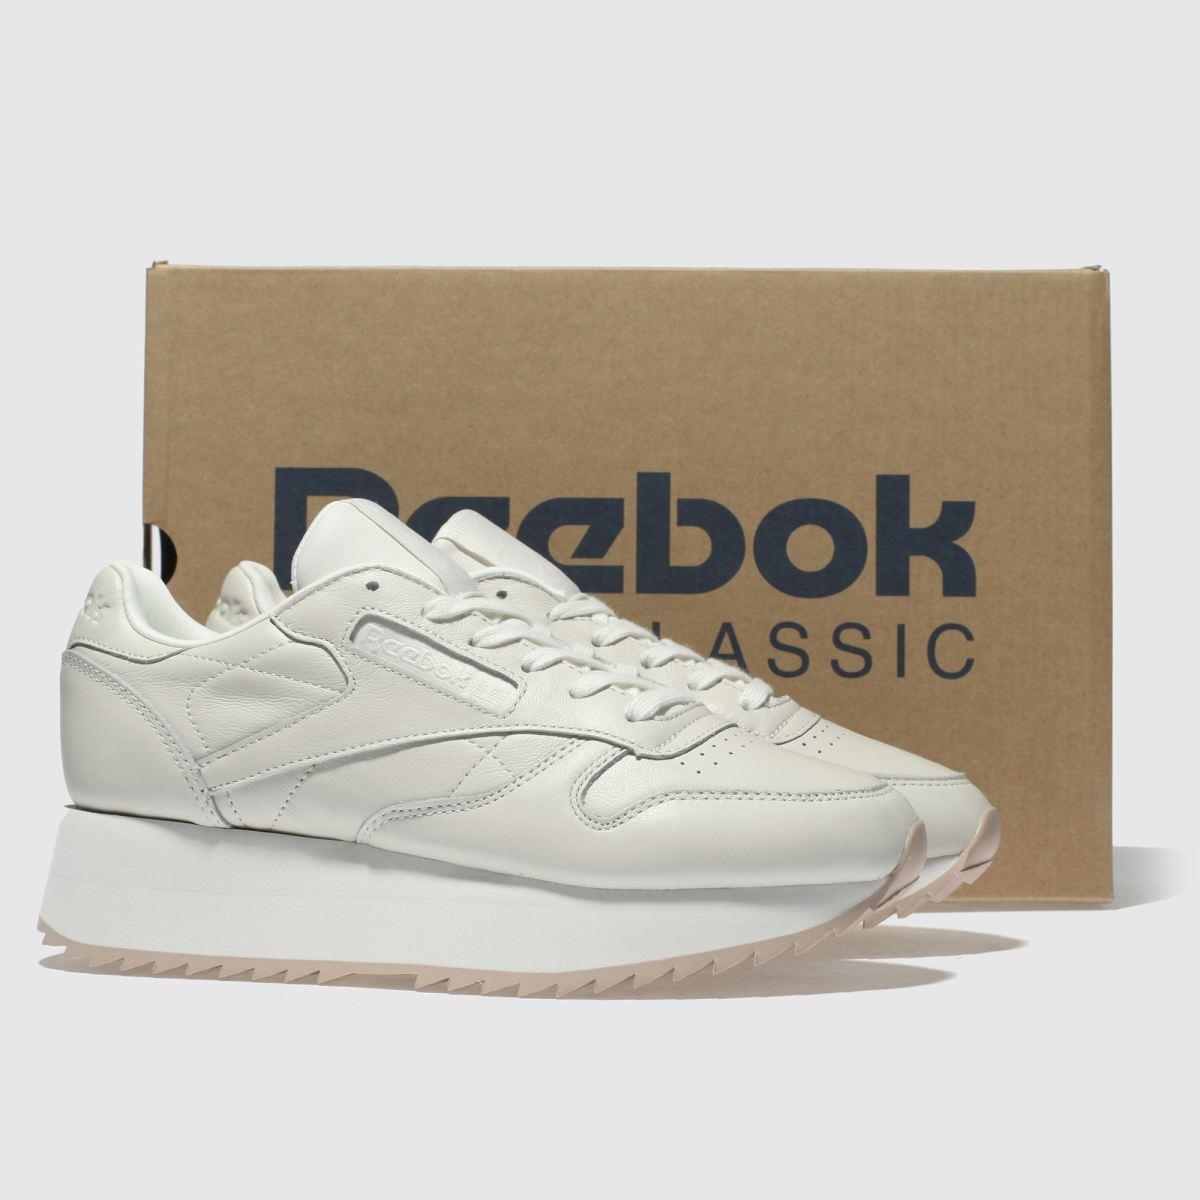 Damen Steingrau reebok | Classic Leather Platform Sneaker | reebok schuh Gute Qualität beliebte Schuhe b58982